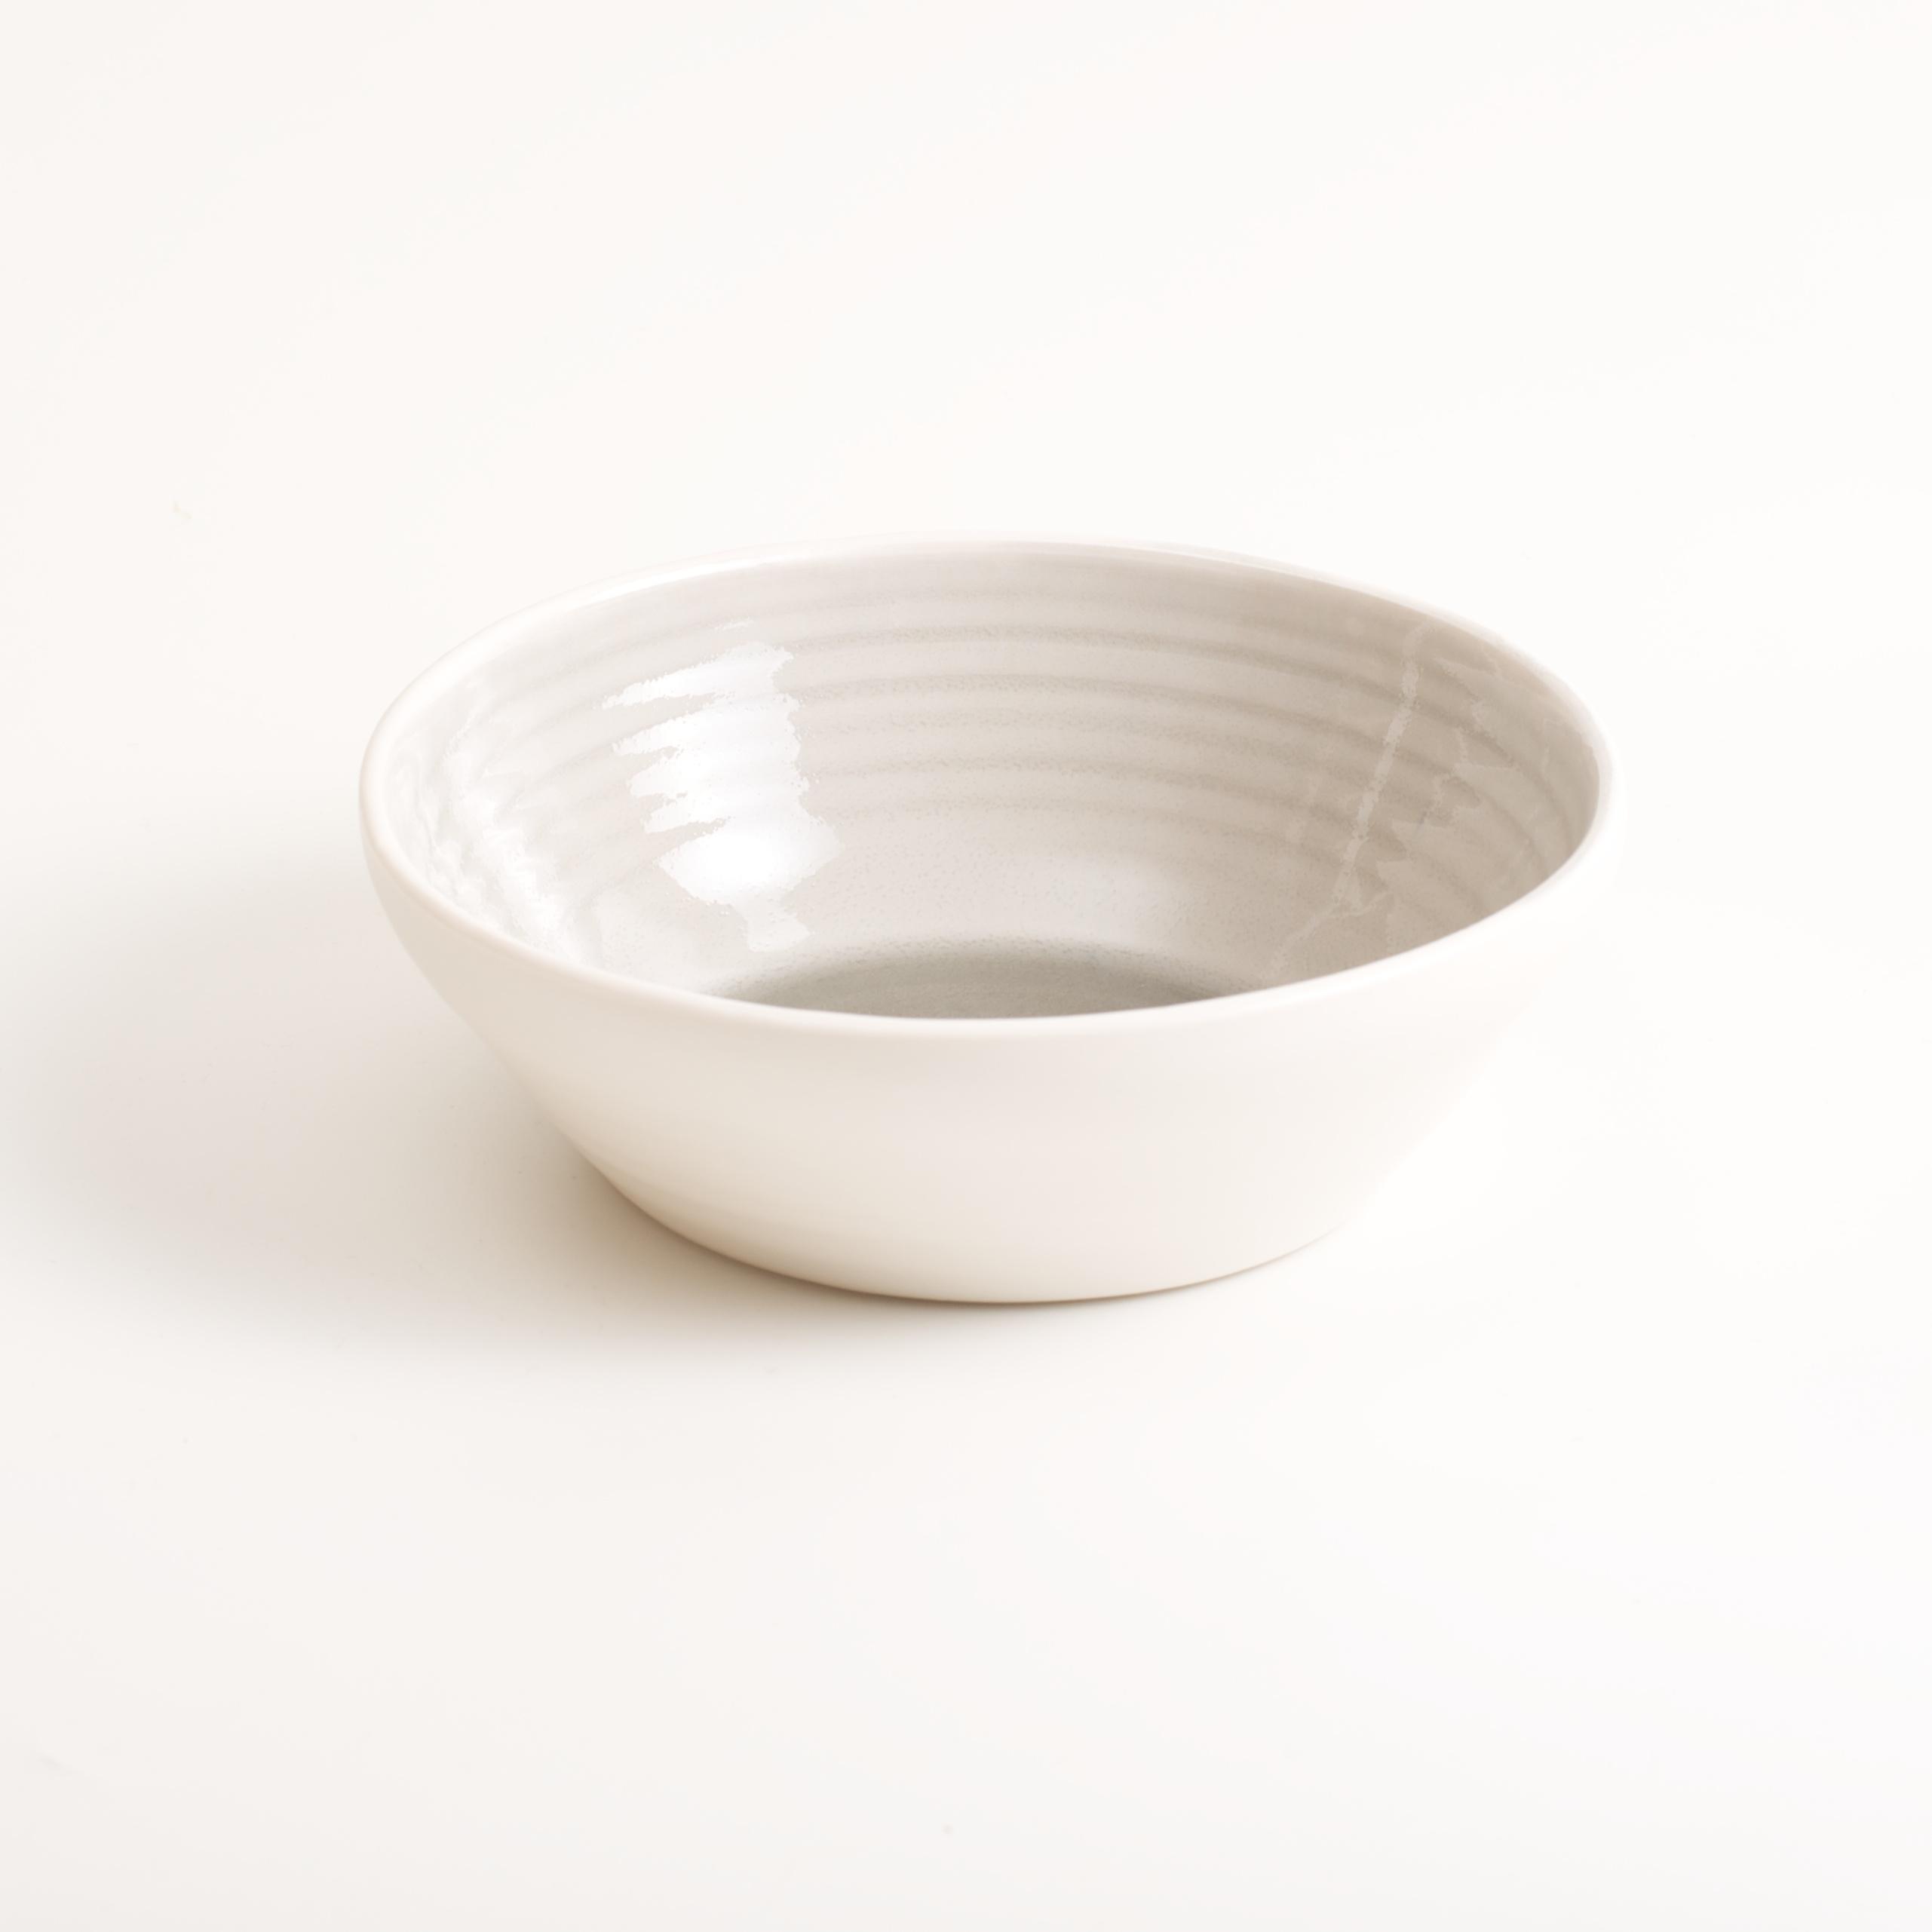 handmade porcelain- bowl - pink- soup bowl- shallow- tableware- dinnerware-